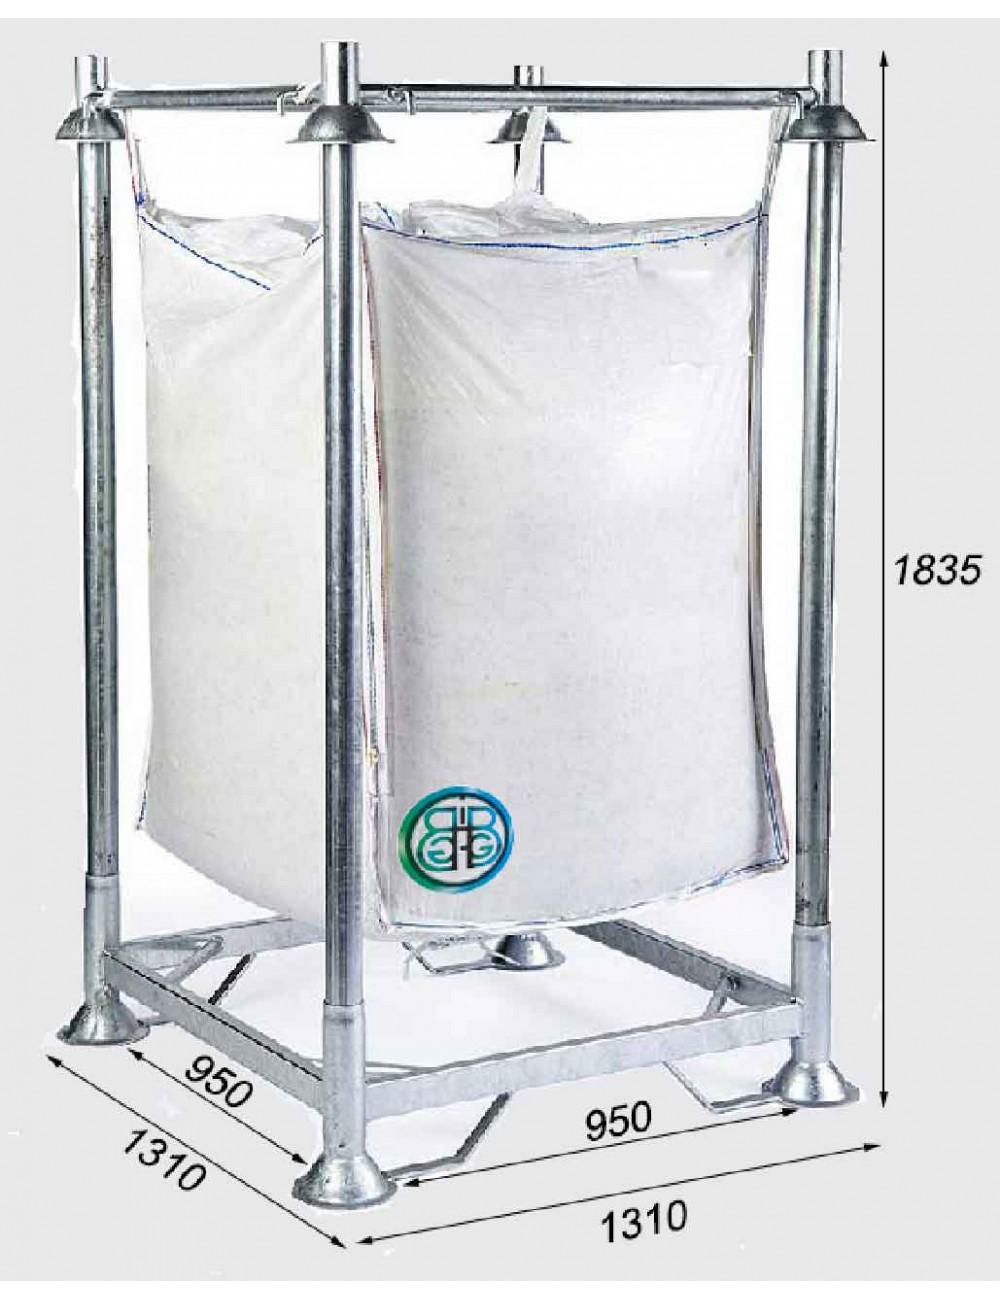 Cadre Support Standard de Big Bag Base Fermée Hauteur 183